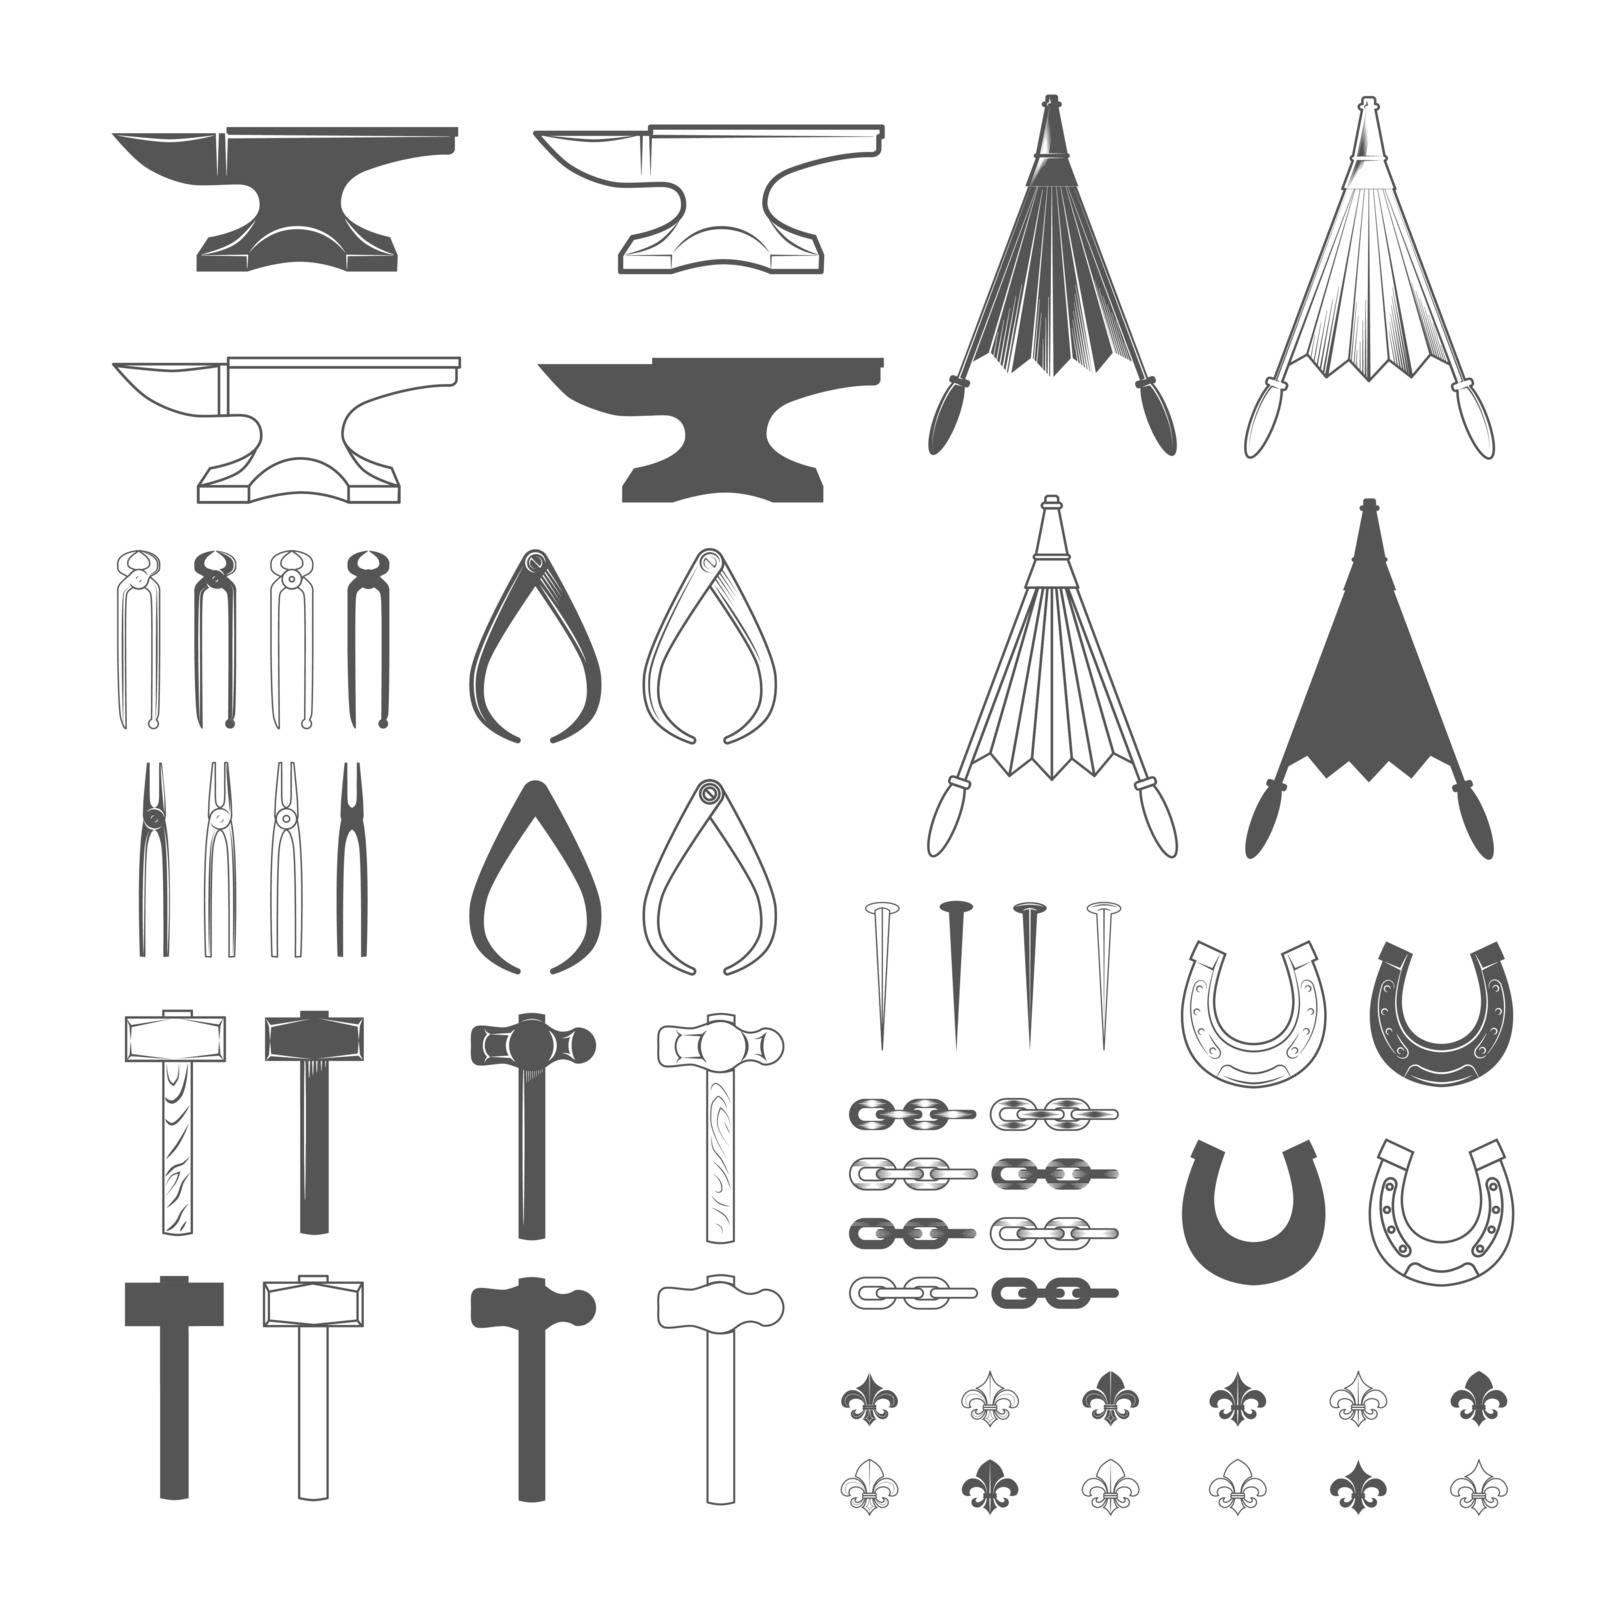 Blacksmith tools. Vintage Style. Vector Illustration isolated on white background.